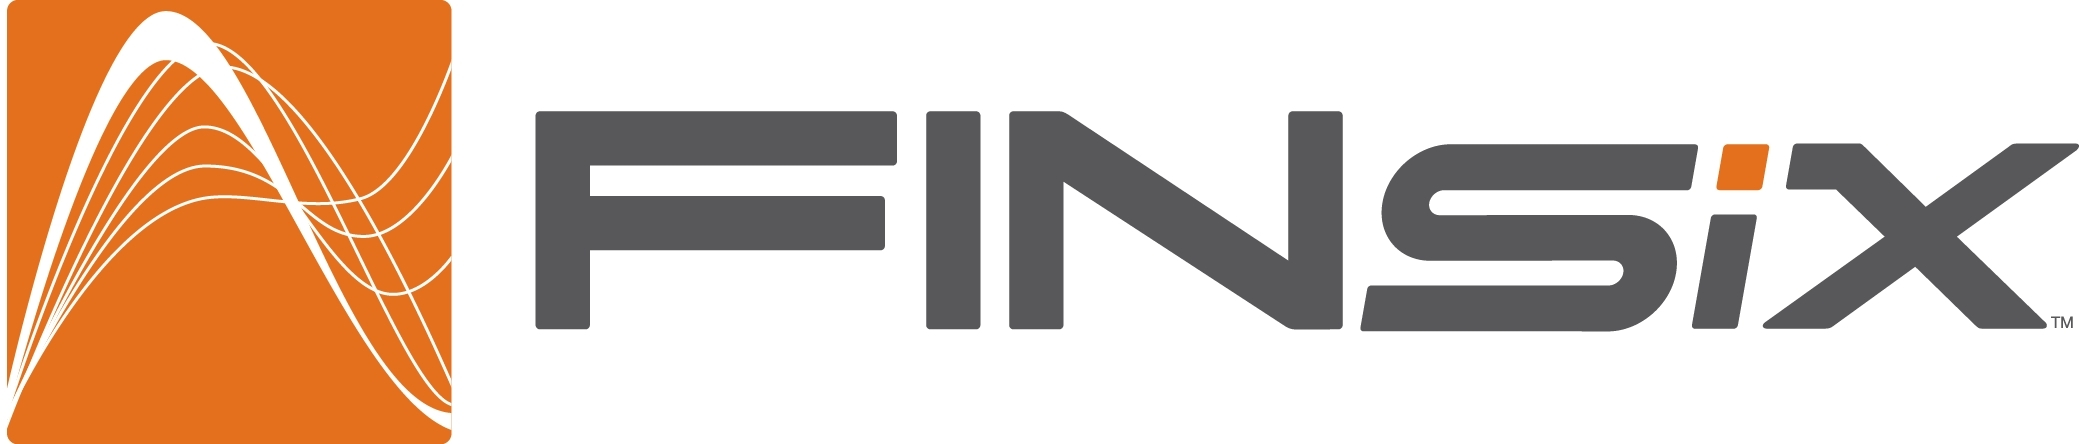 Resultado de imagen de finsix logo